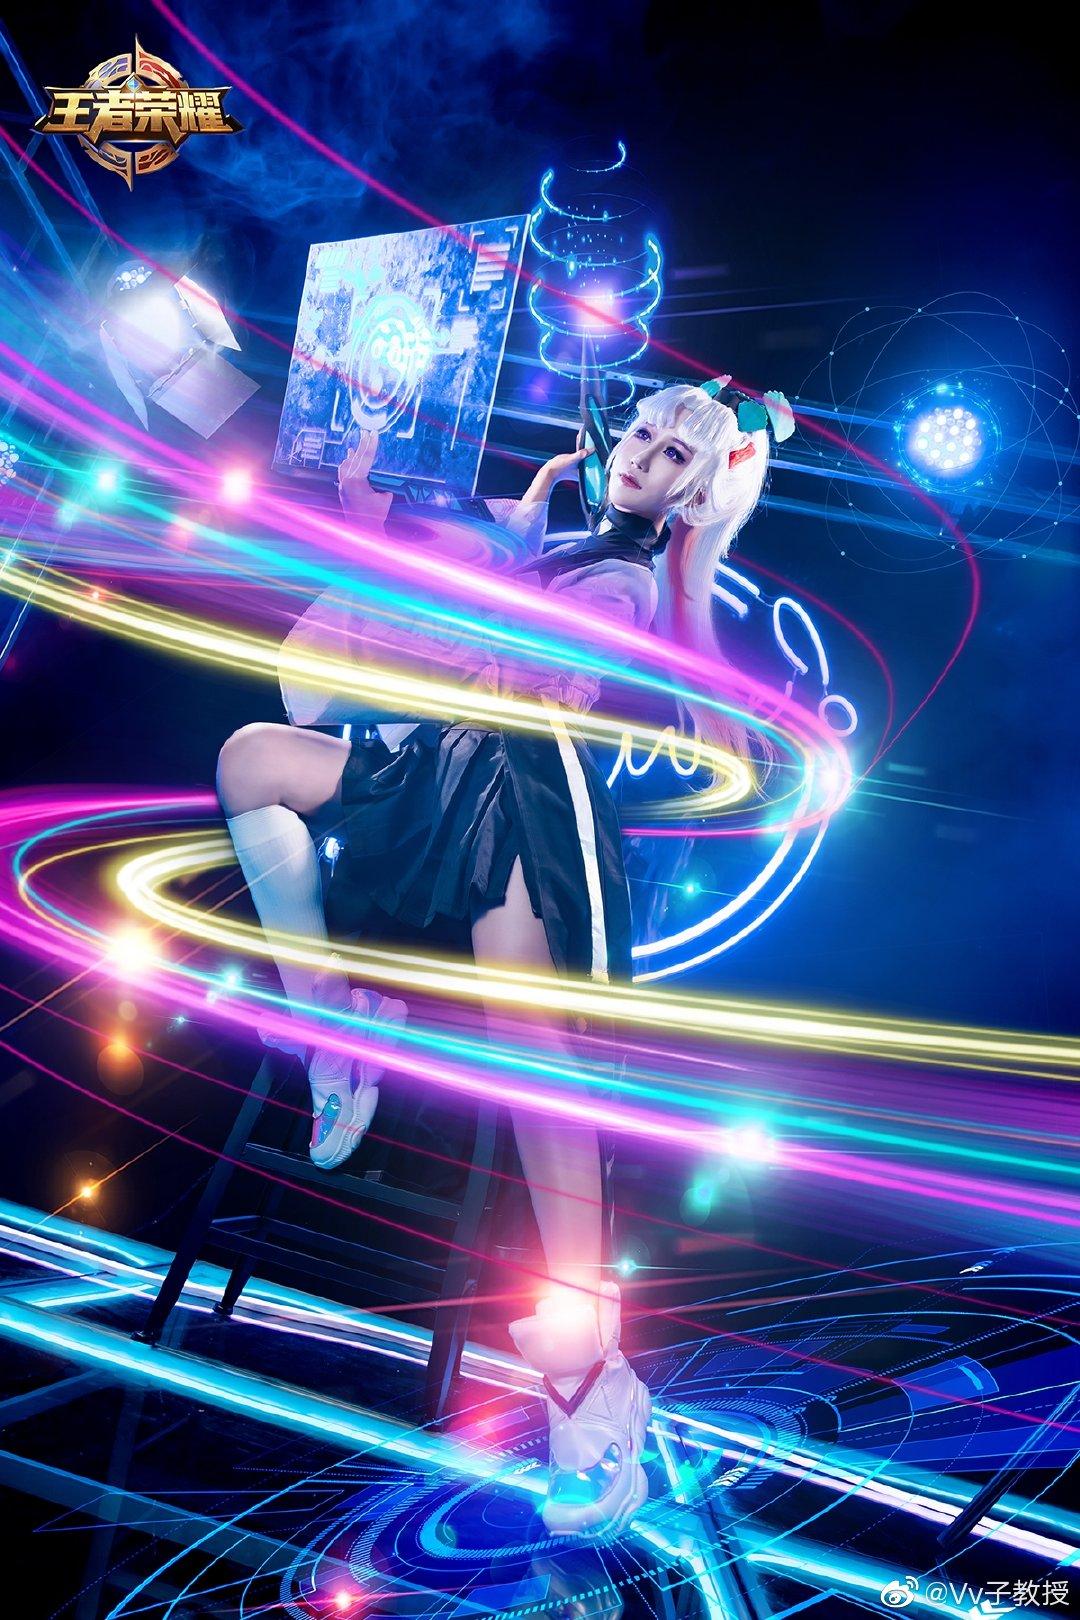 [COS]王者荣耀   上官婉儿   天狼绘梦者   @Vv子教授 (9P) -cosplay古风服装图片下载插图